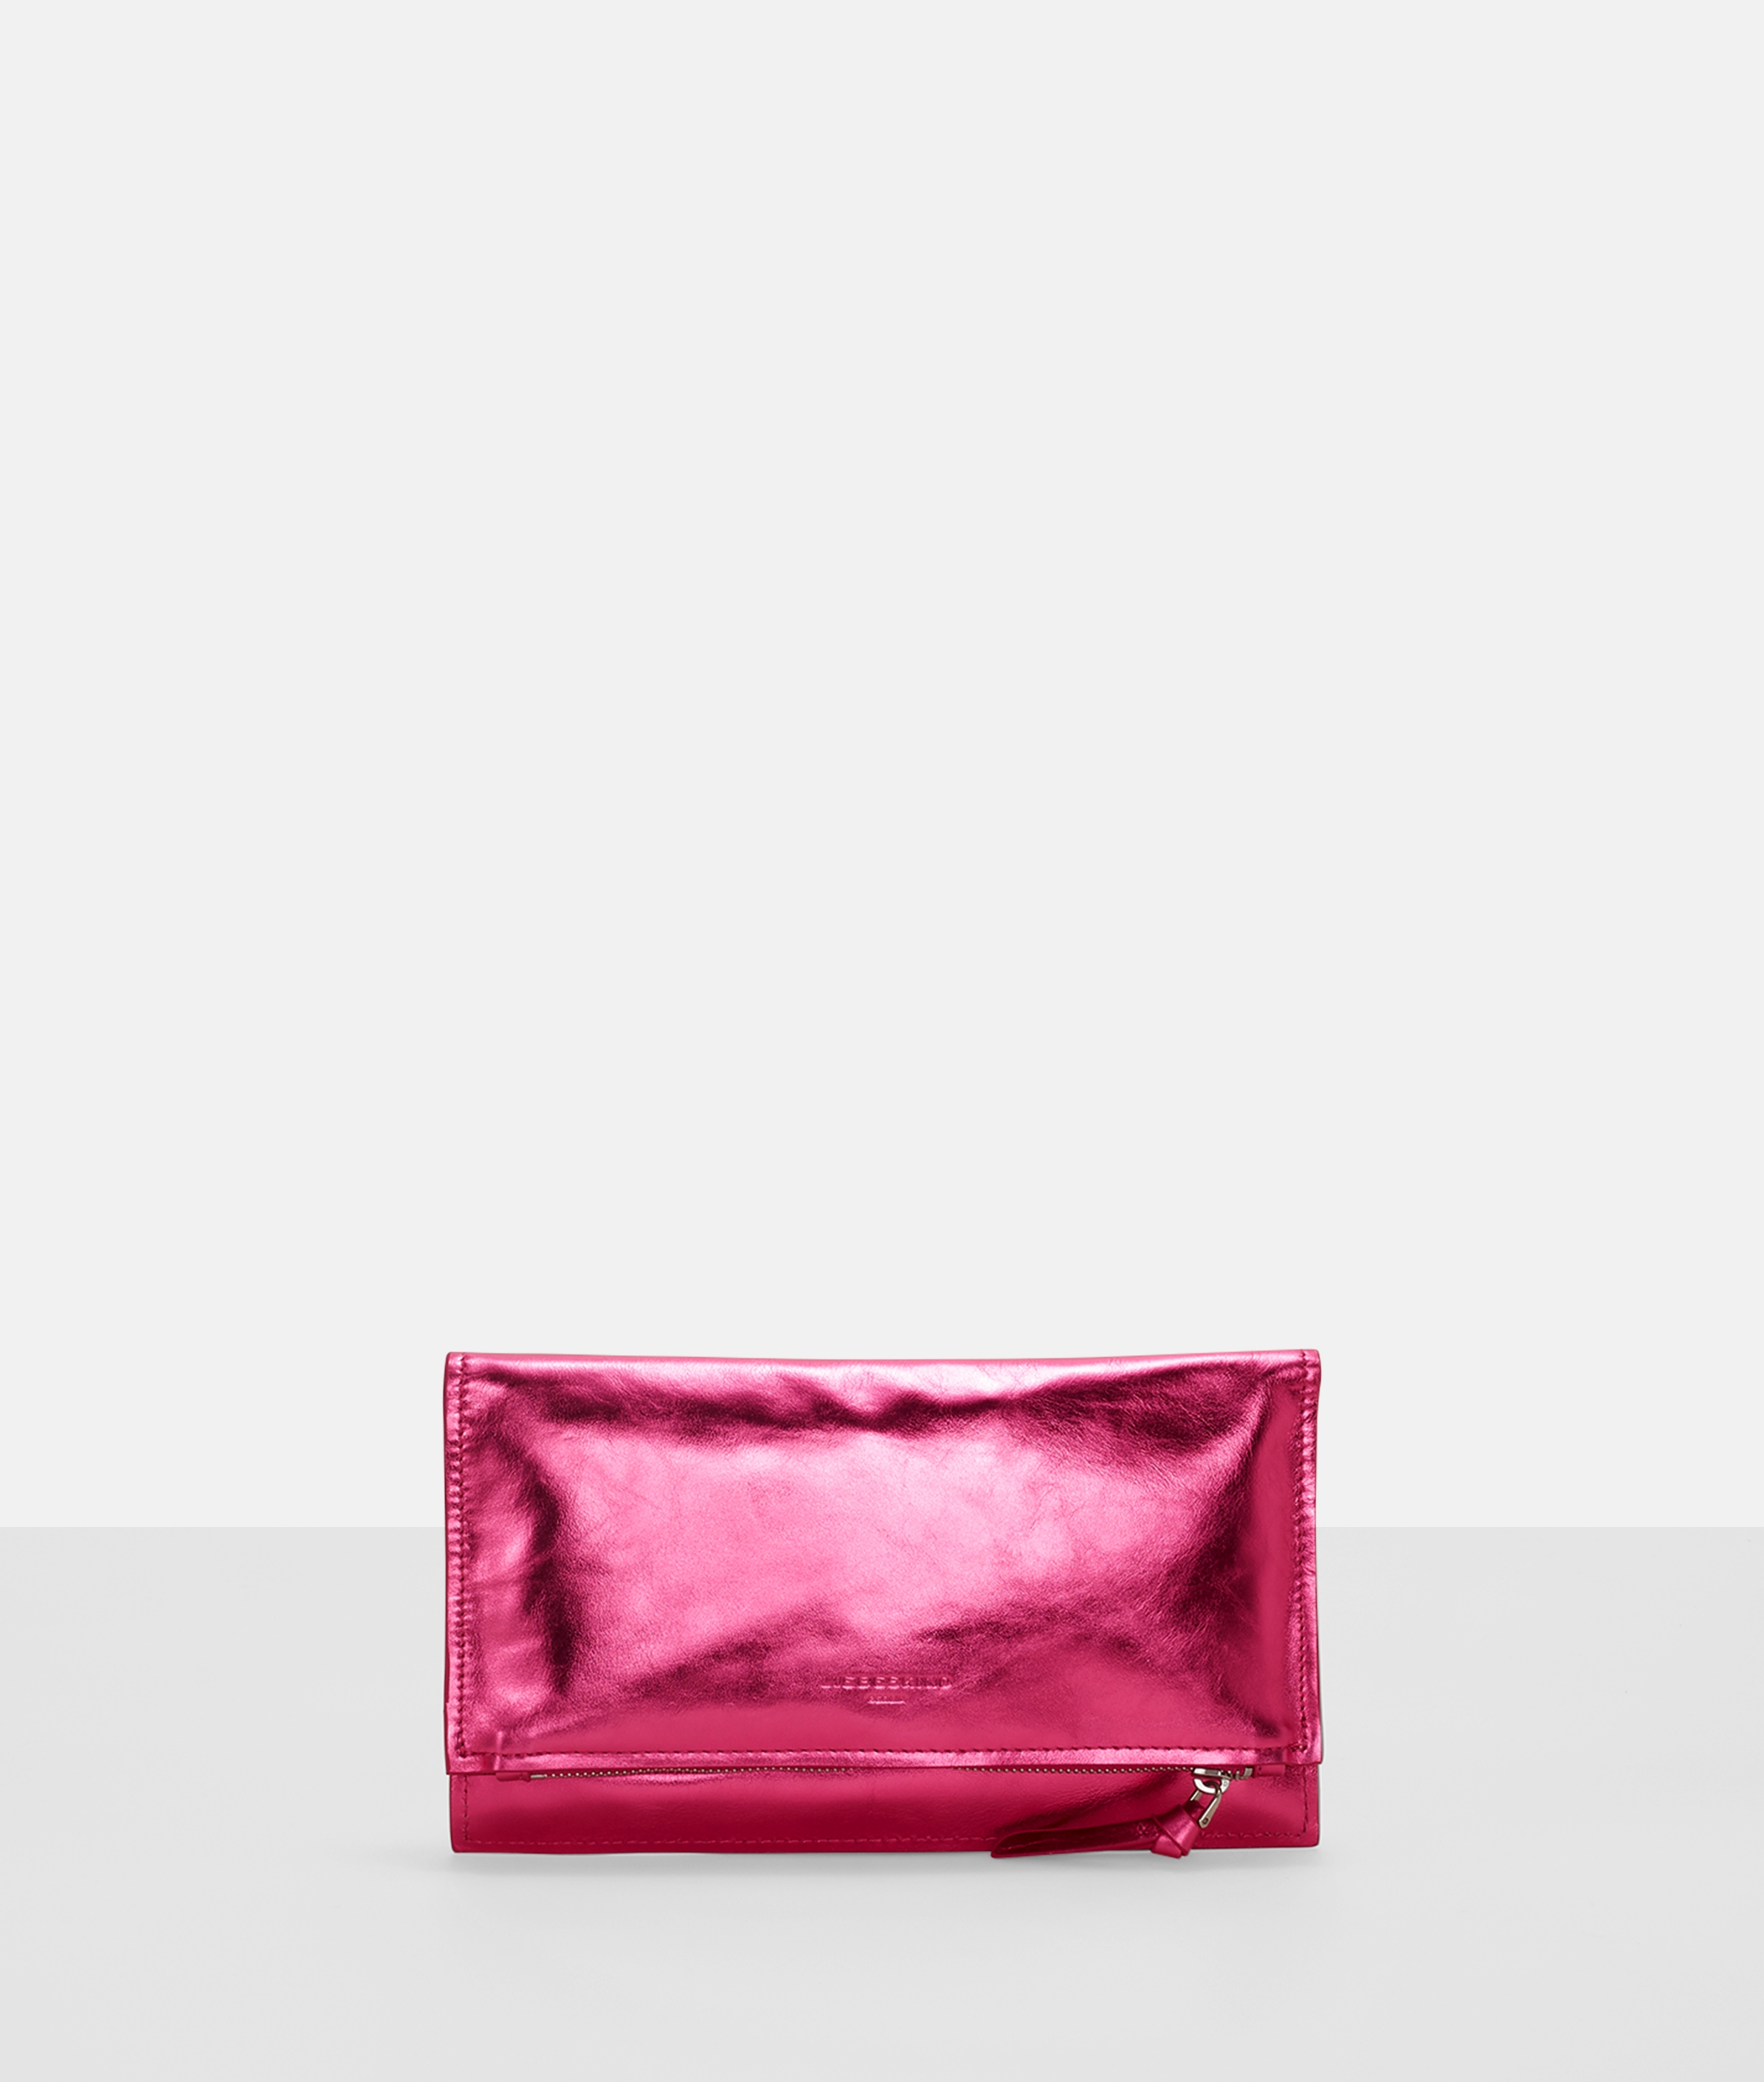 Berlin Tasche Scarlet 8V, Pink